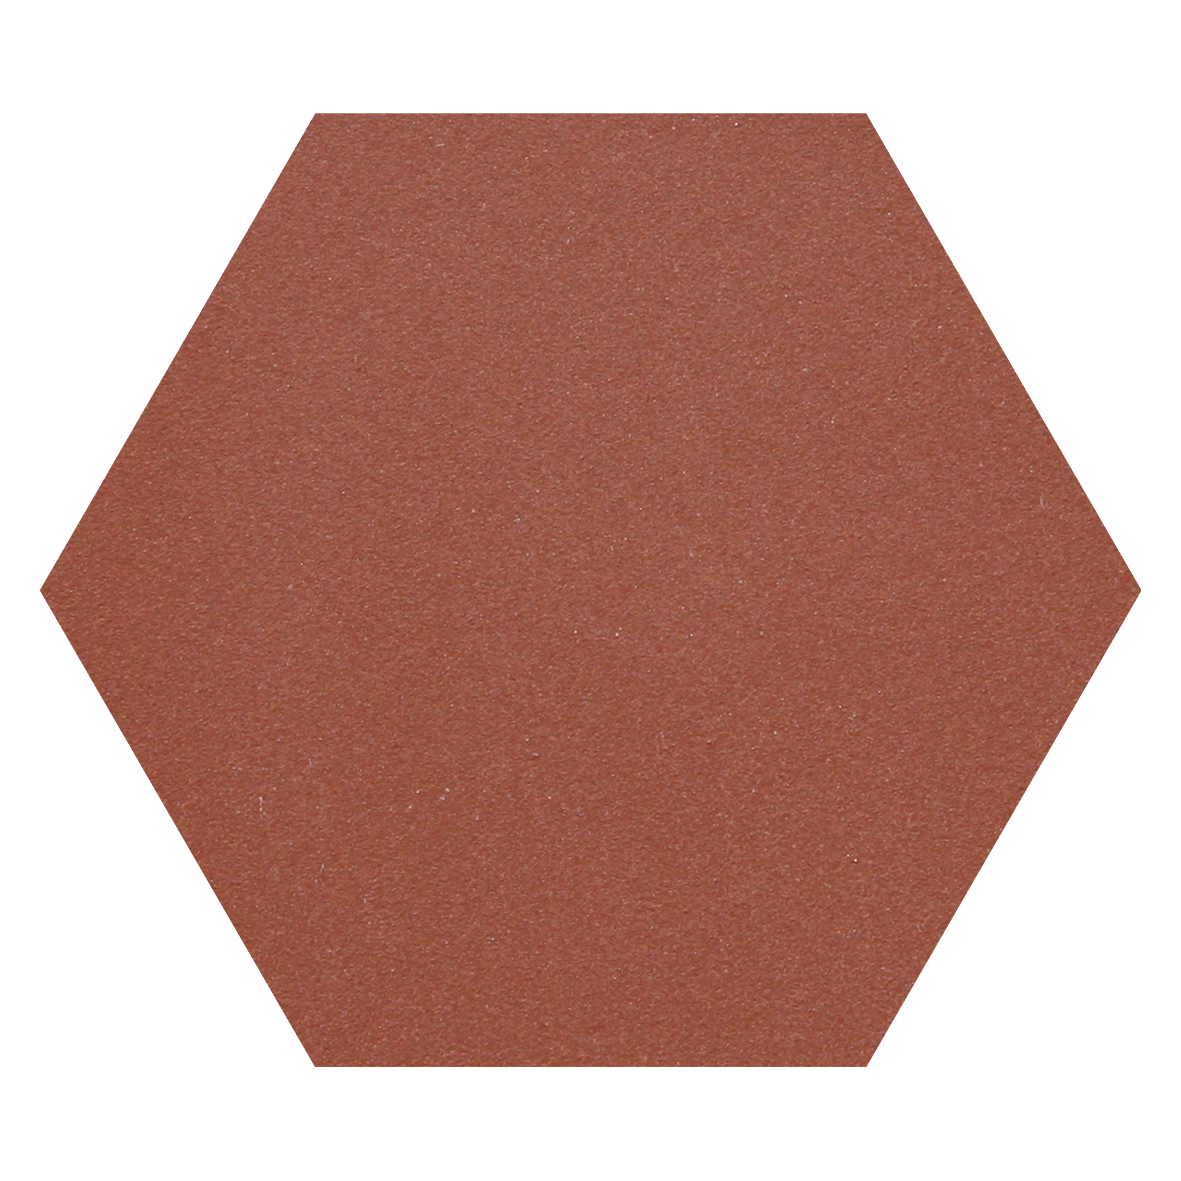 PNM360622, Natura, Punainen, seina,lattia,pakkasenkesto,uimahalli,design_from_finland